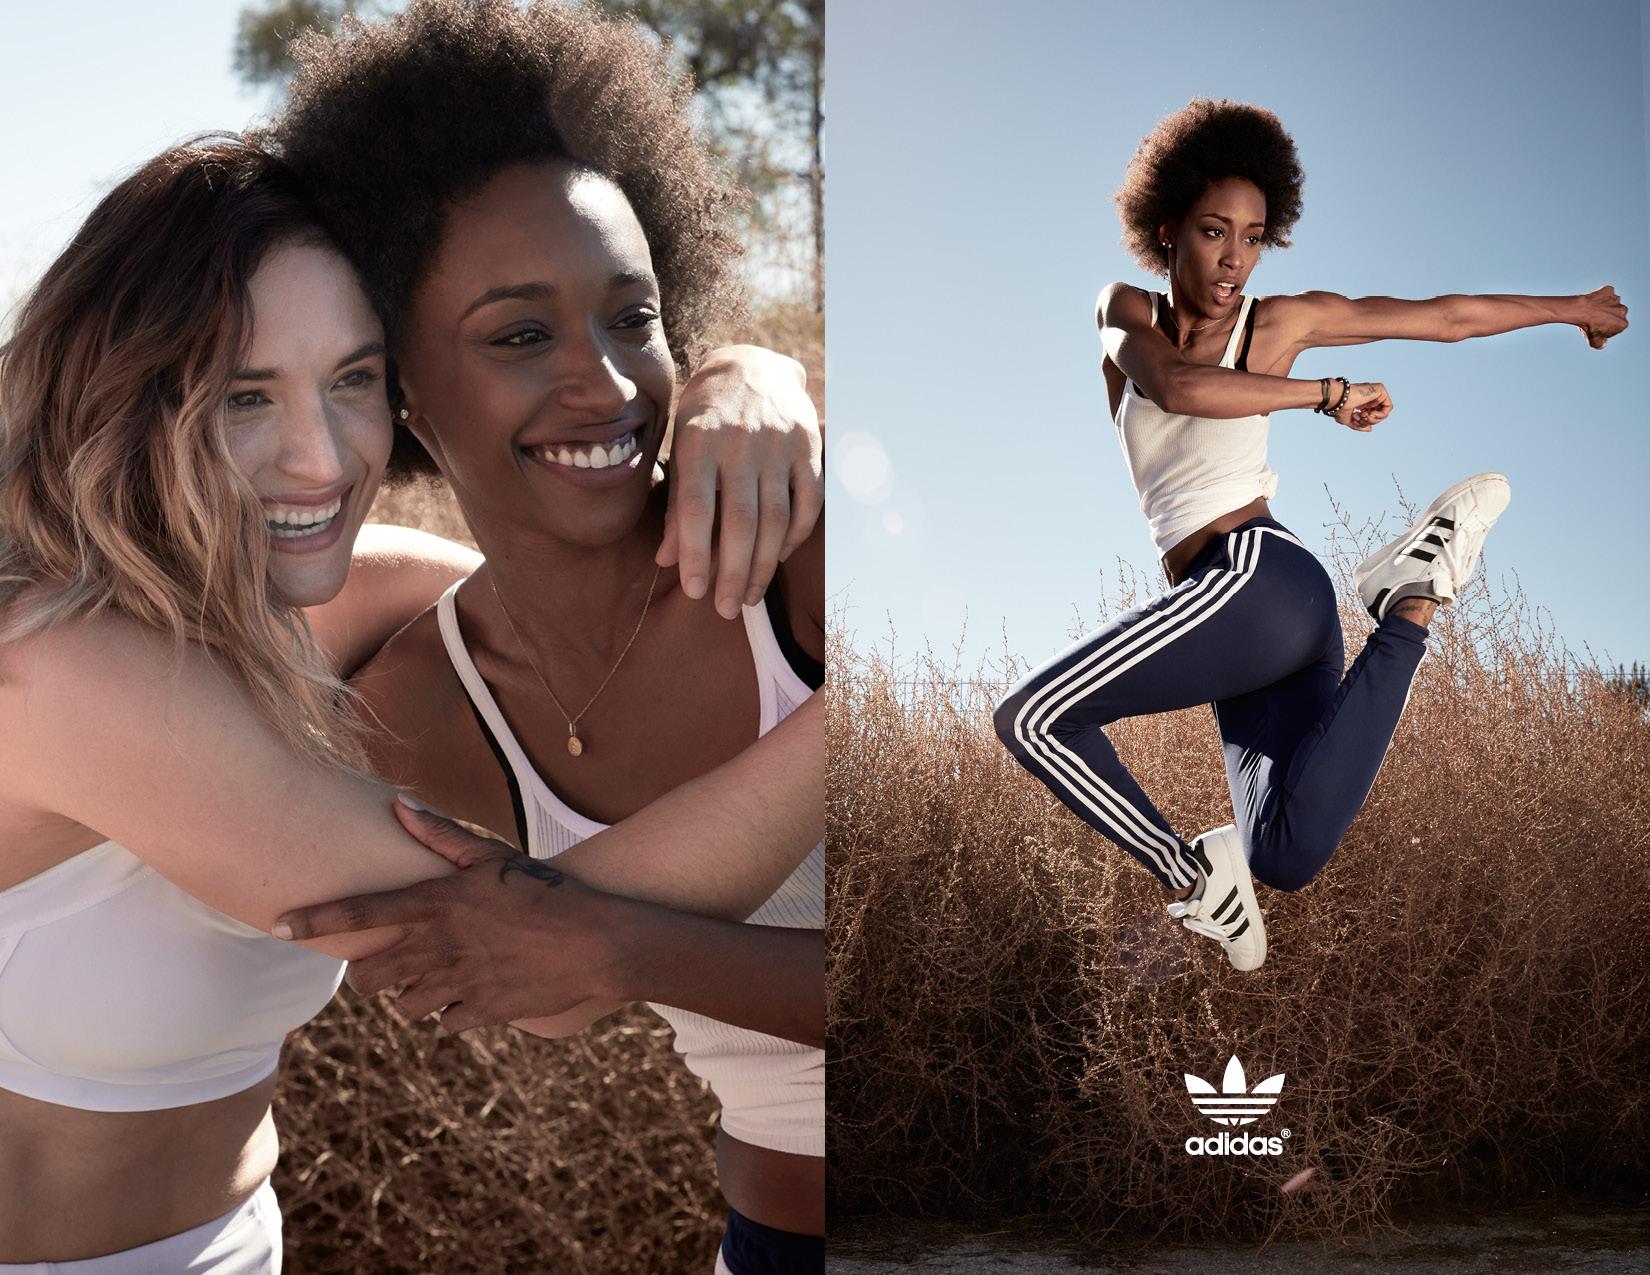 adidas_PROOF1_layouts12.jpg